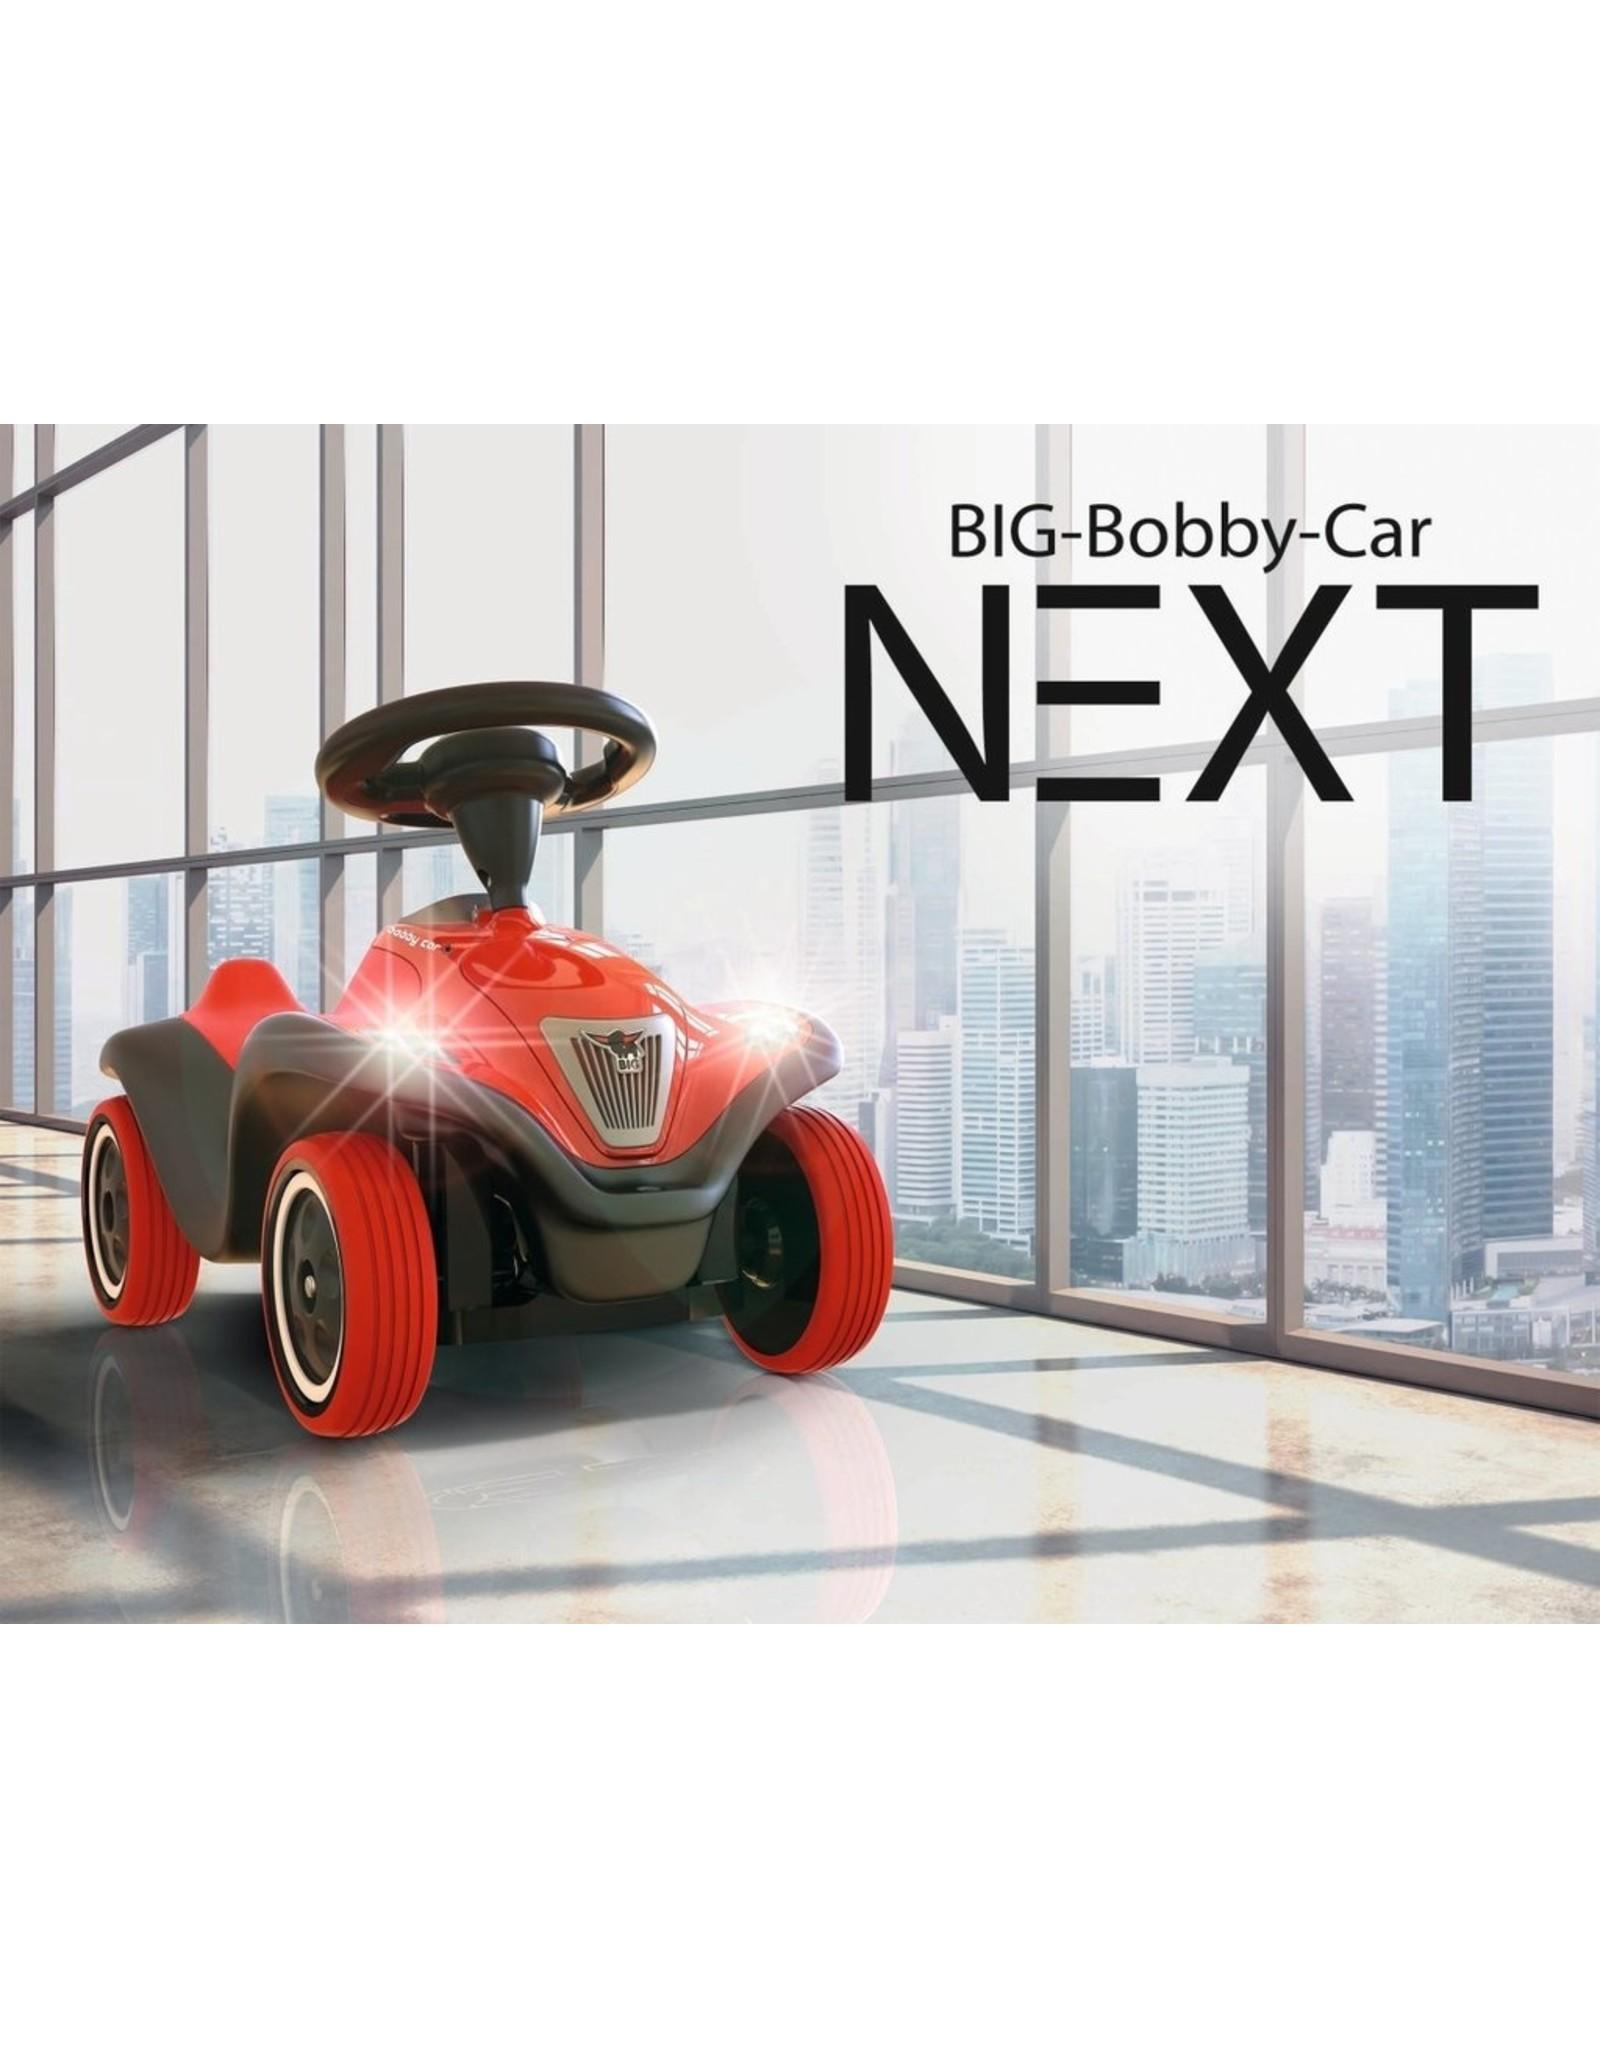 BIG BIG Bobby Car NEXT